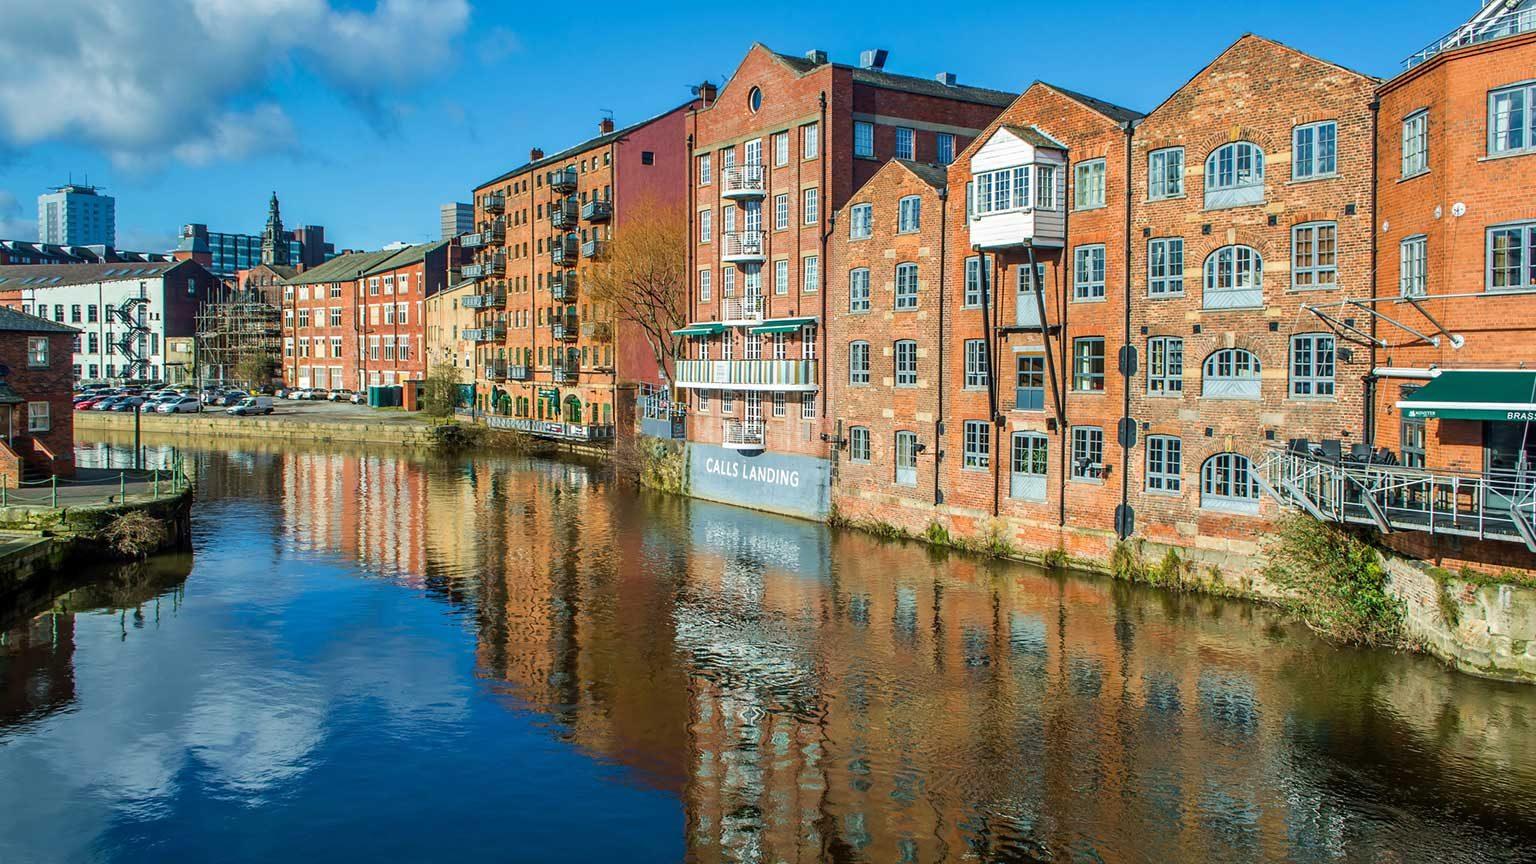 Watersways in Leeds.